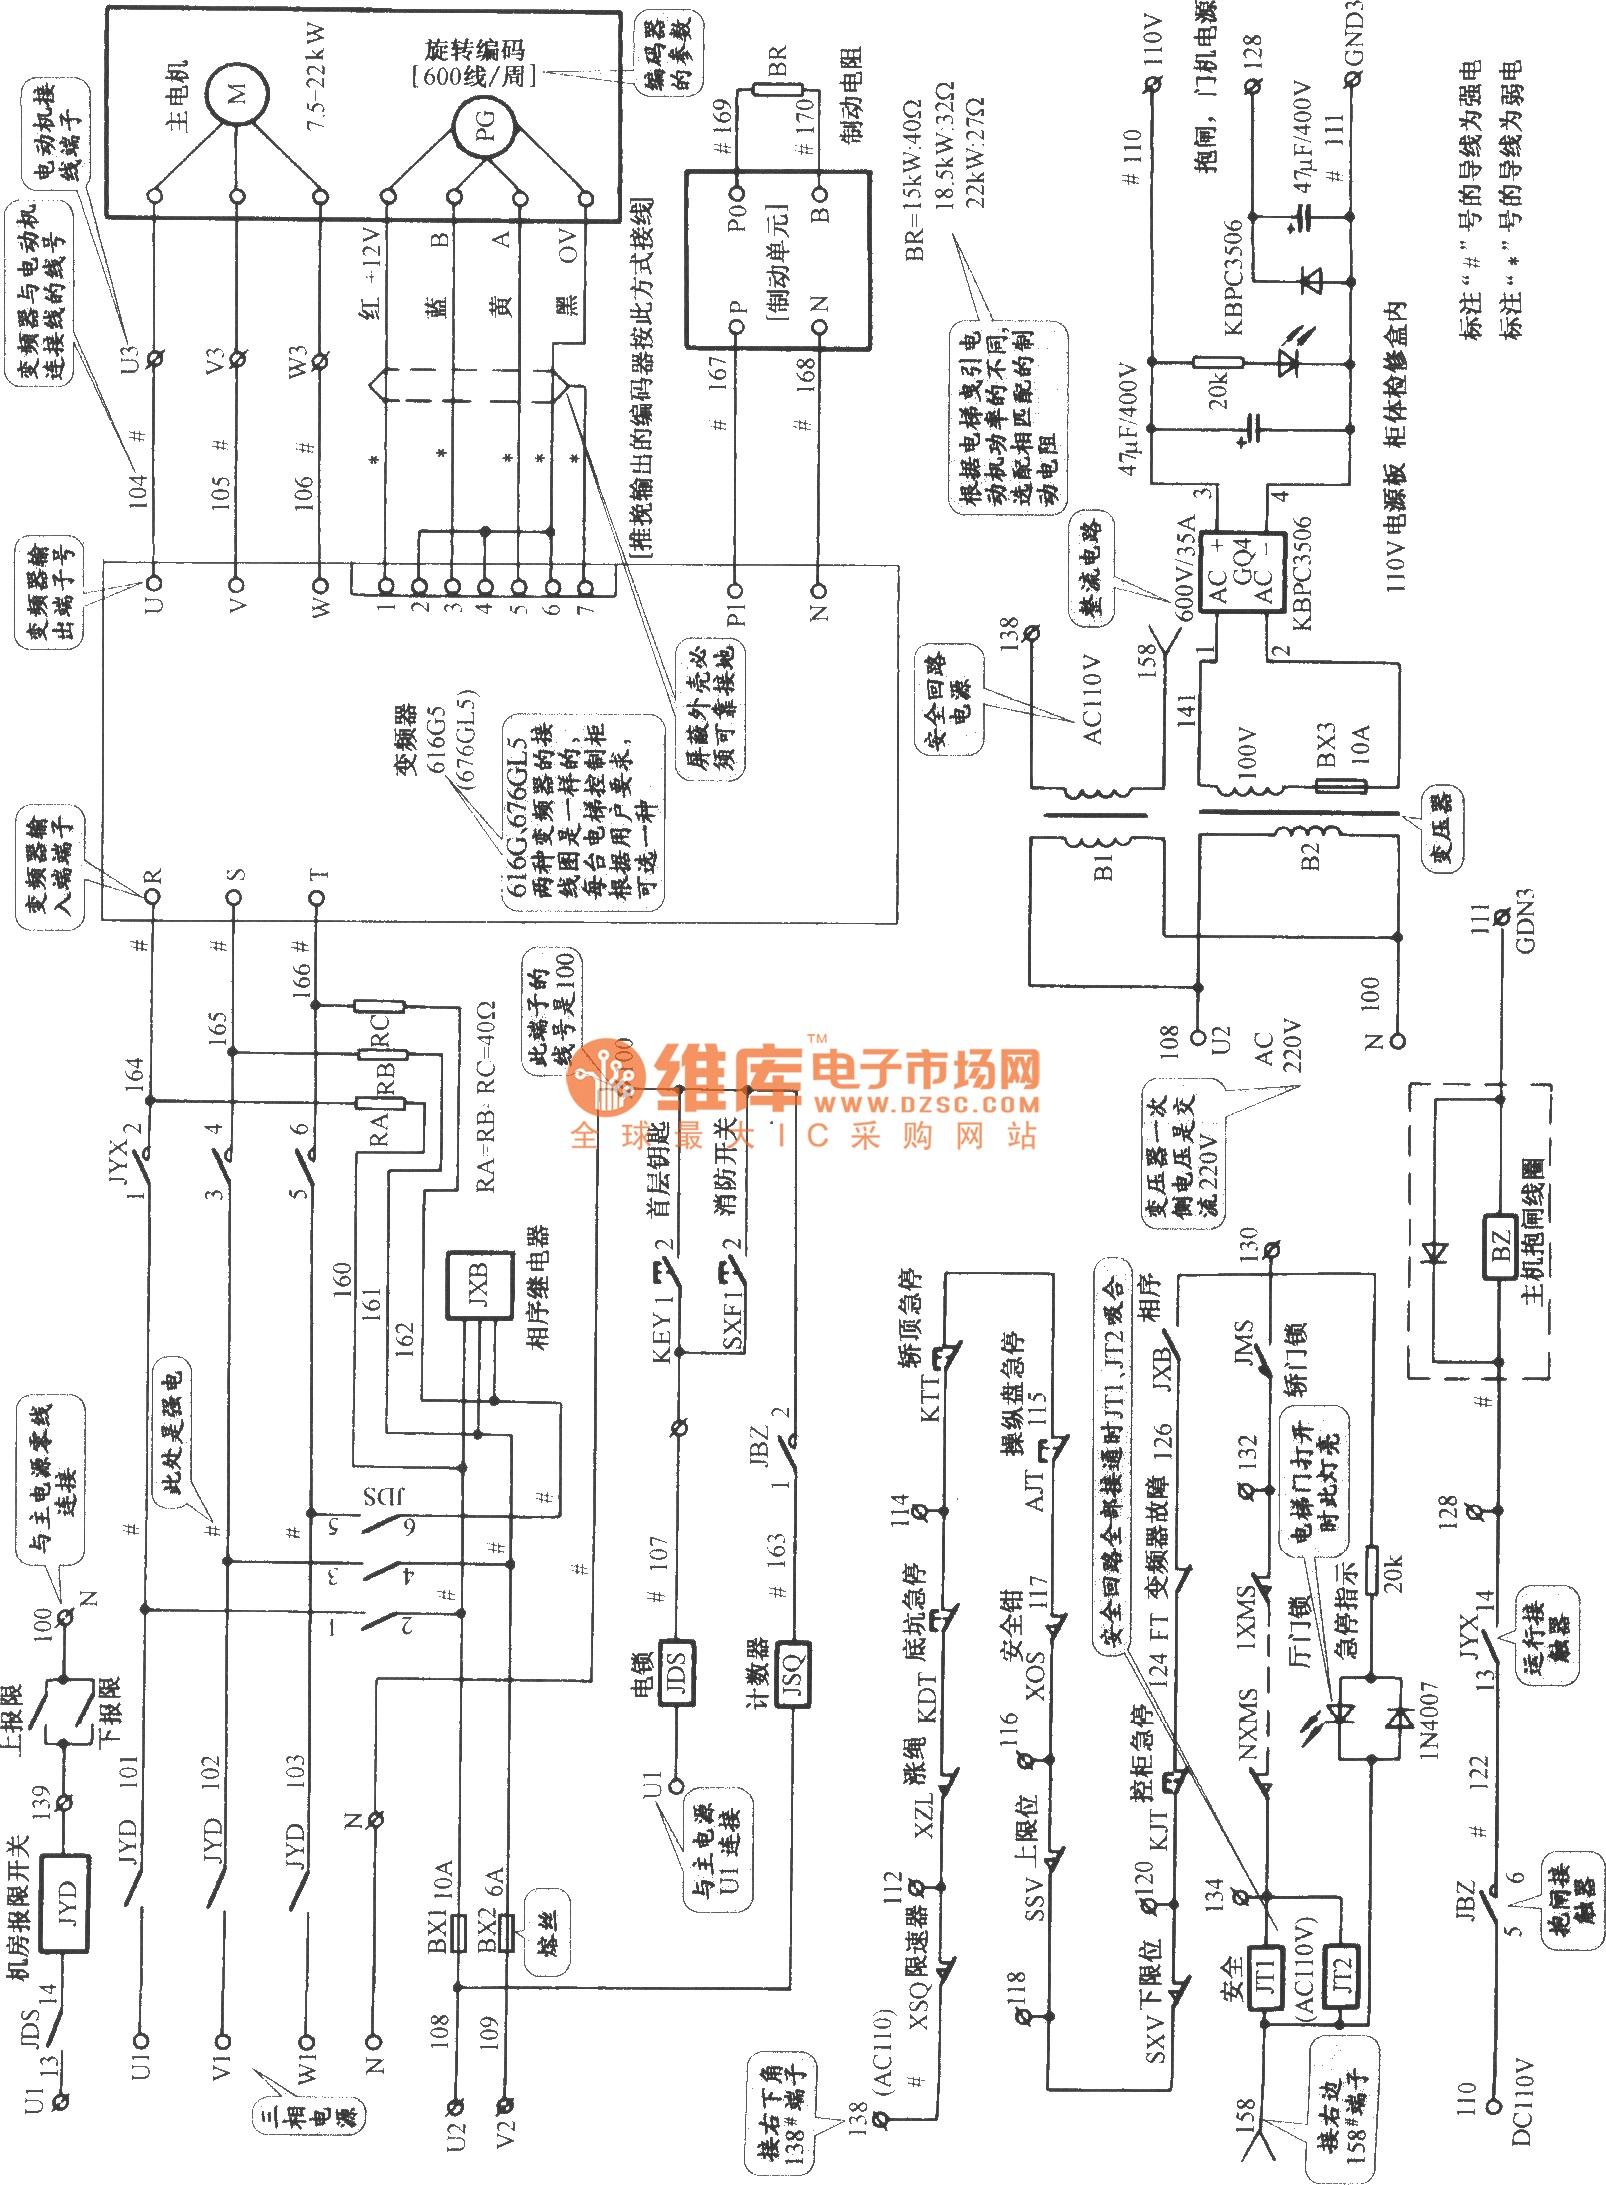 230 volt submersible pump wiring diagram lost timeline deep well schematic elsavadorla